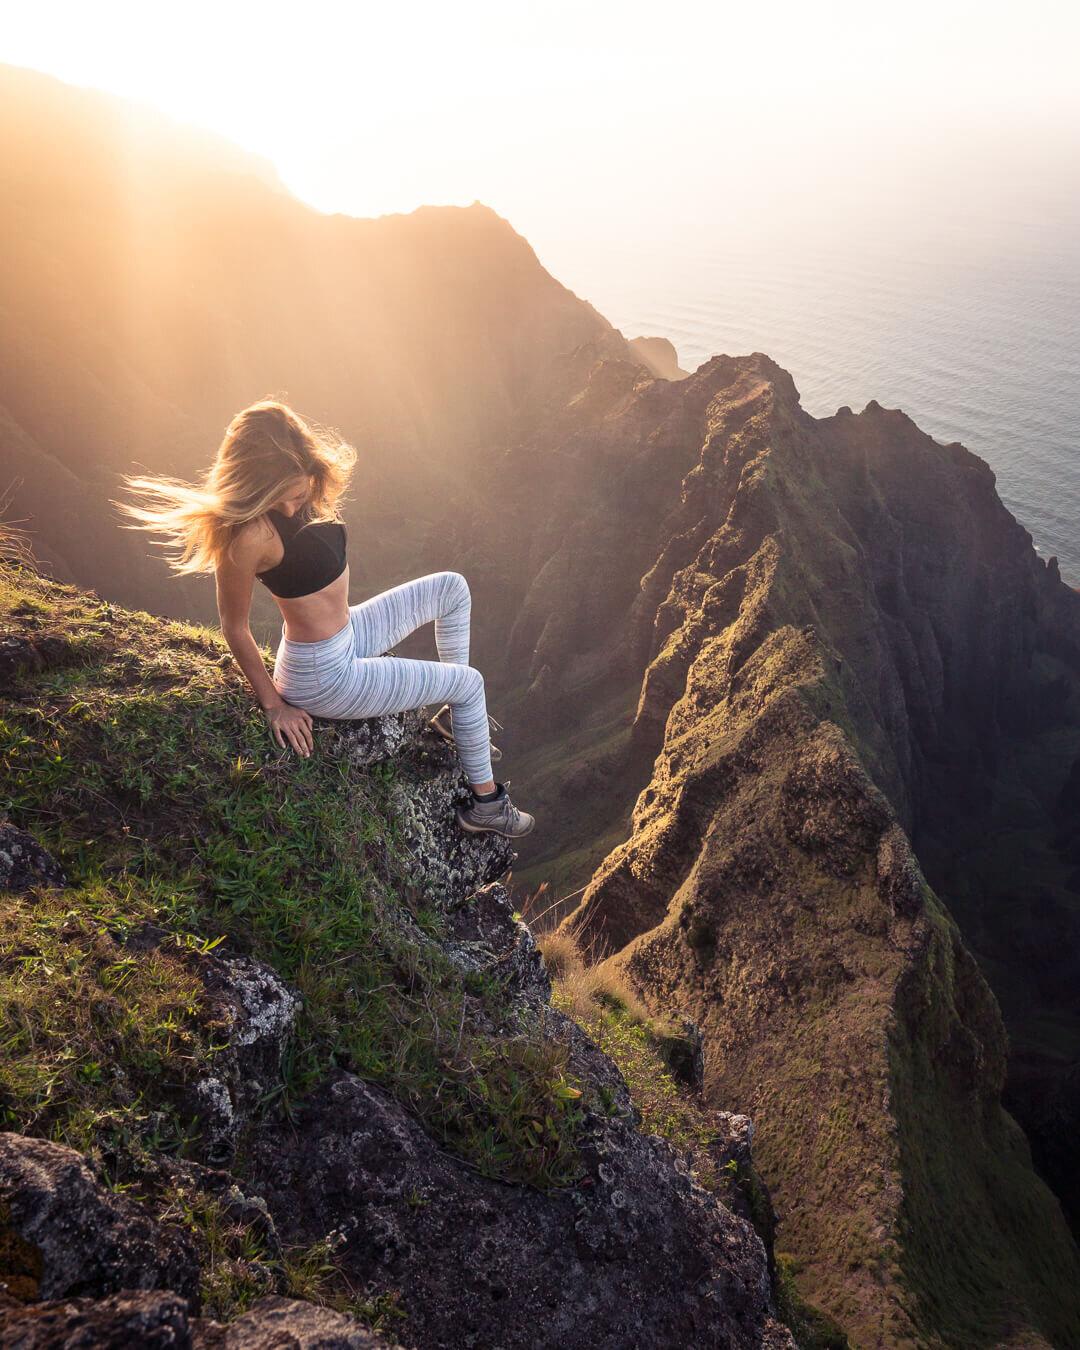 Kauai has a ton of amazing ridge hikes along the Na Pali Coast.